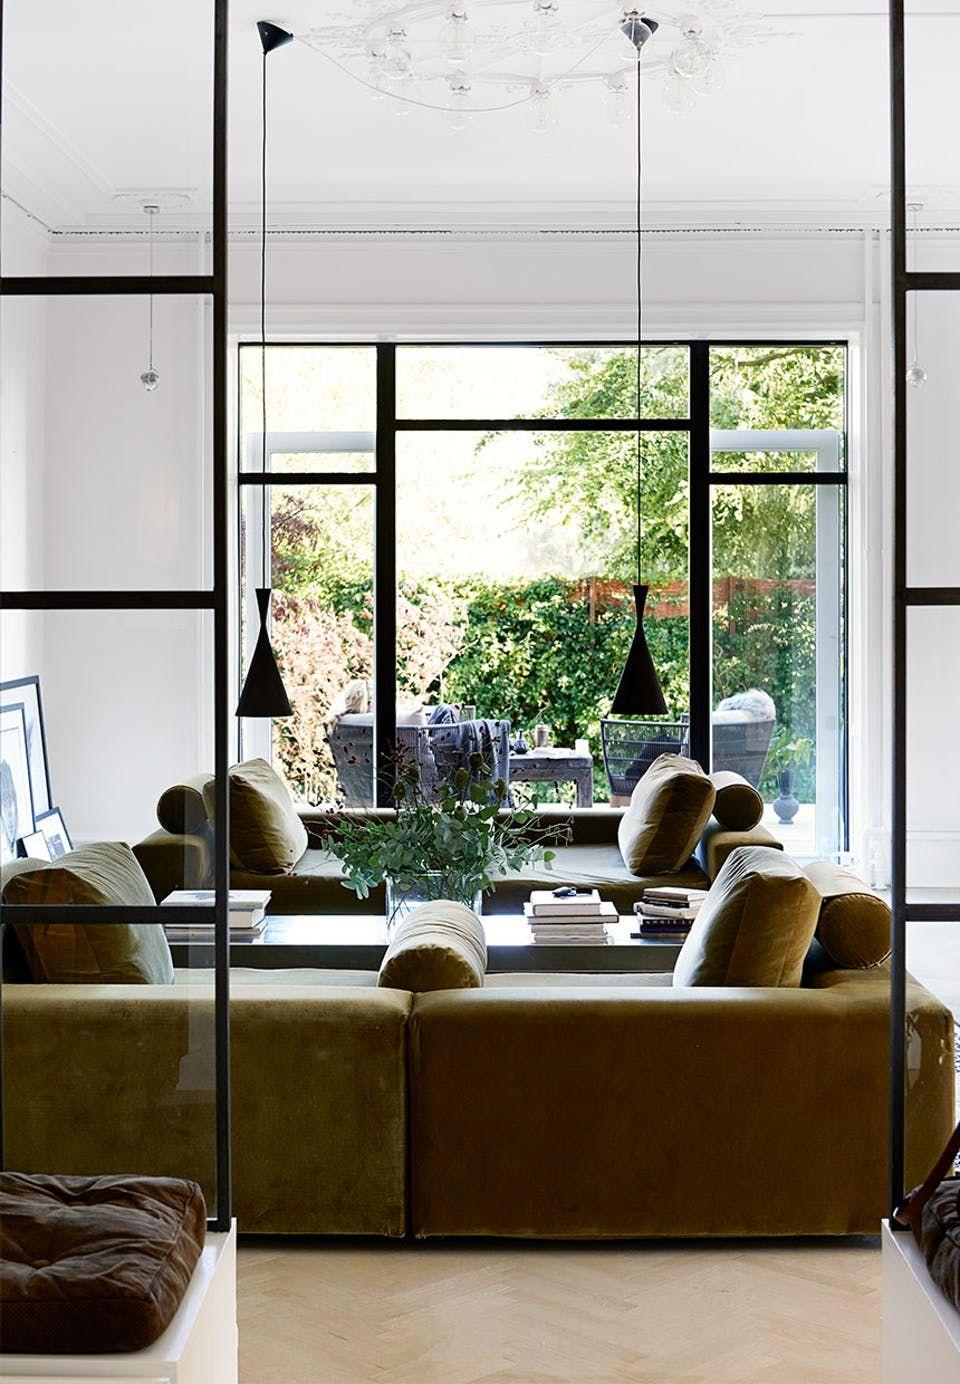 Symmetry in this lovely living room